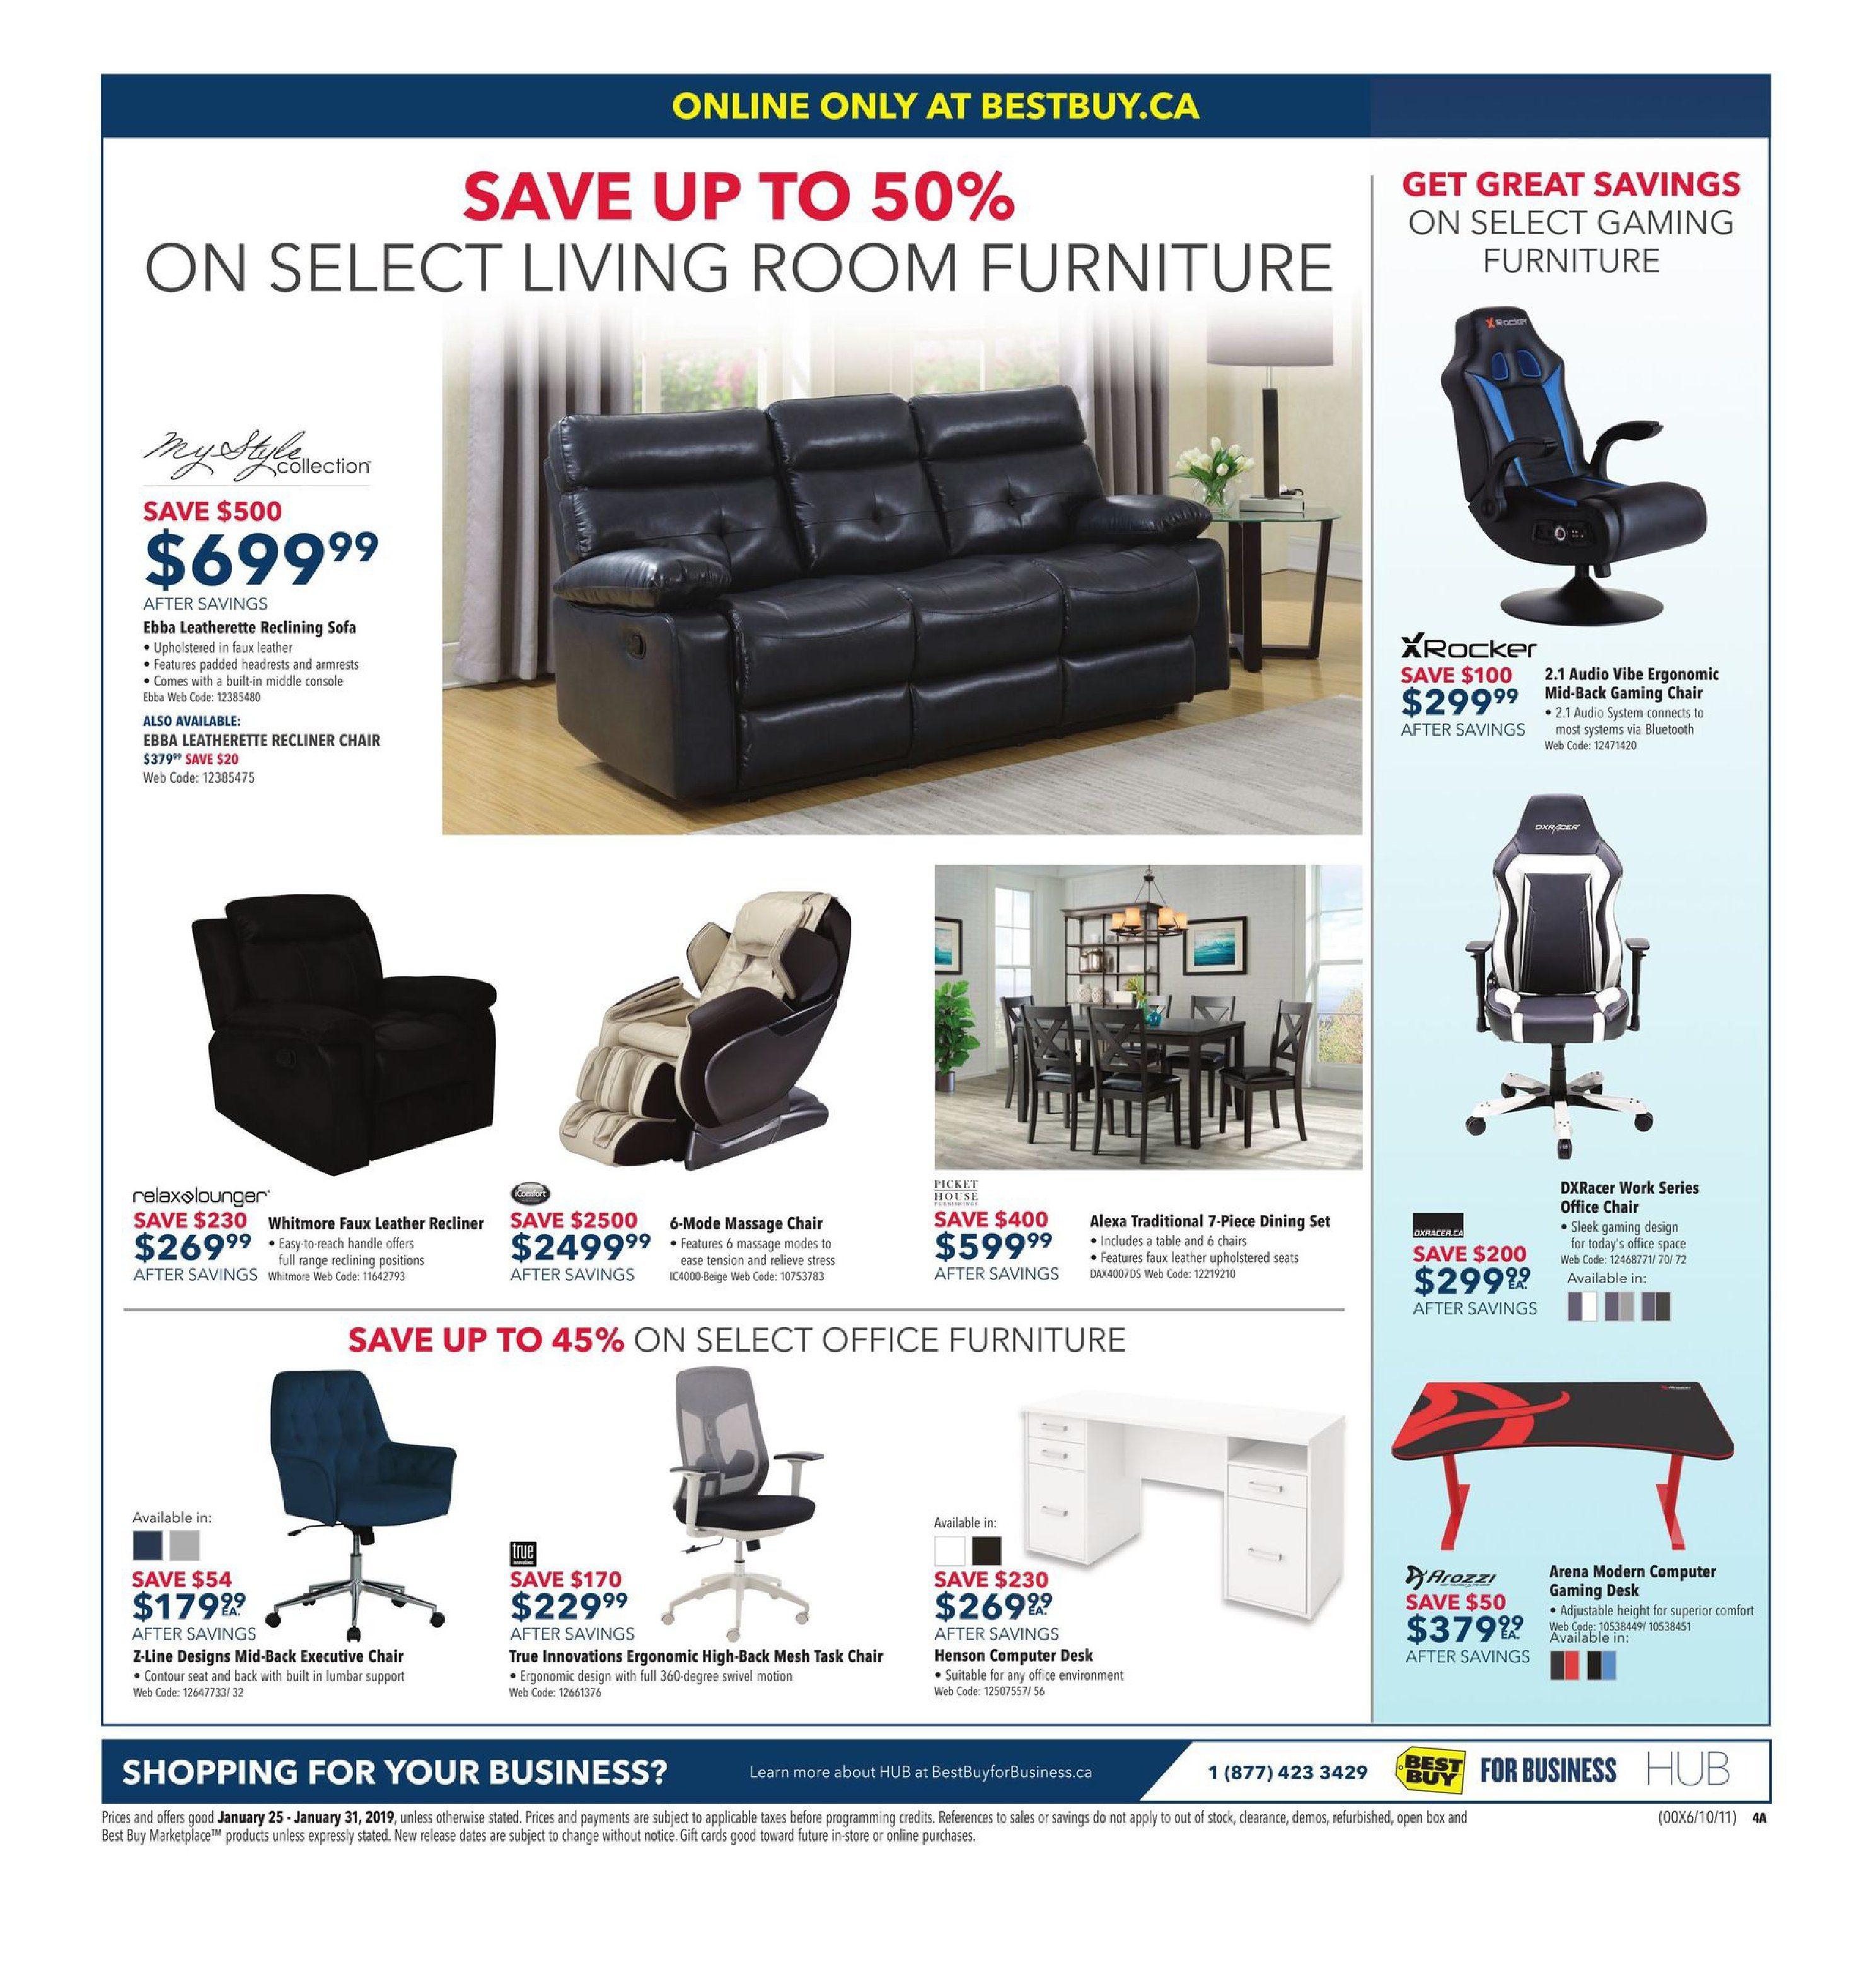 Enjoyable Best Buy Weekly Flyer Weekly Amazing Deals Jan 25 31 Creativecarmelina Interior Chair Design Creativecarmelinacom